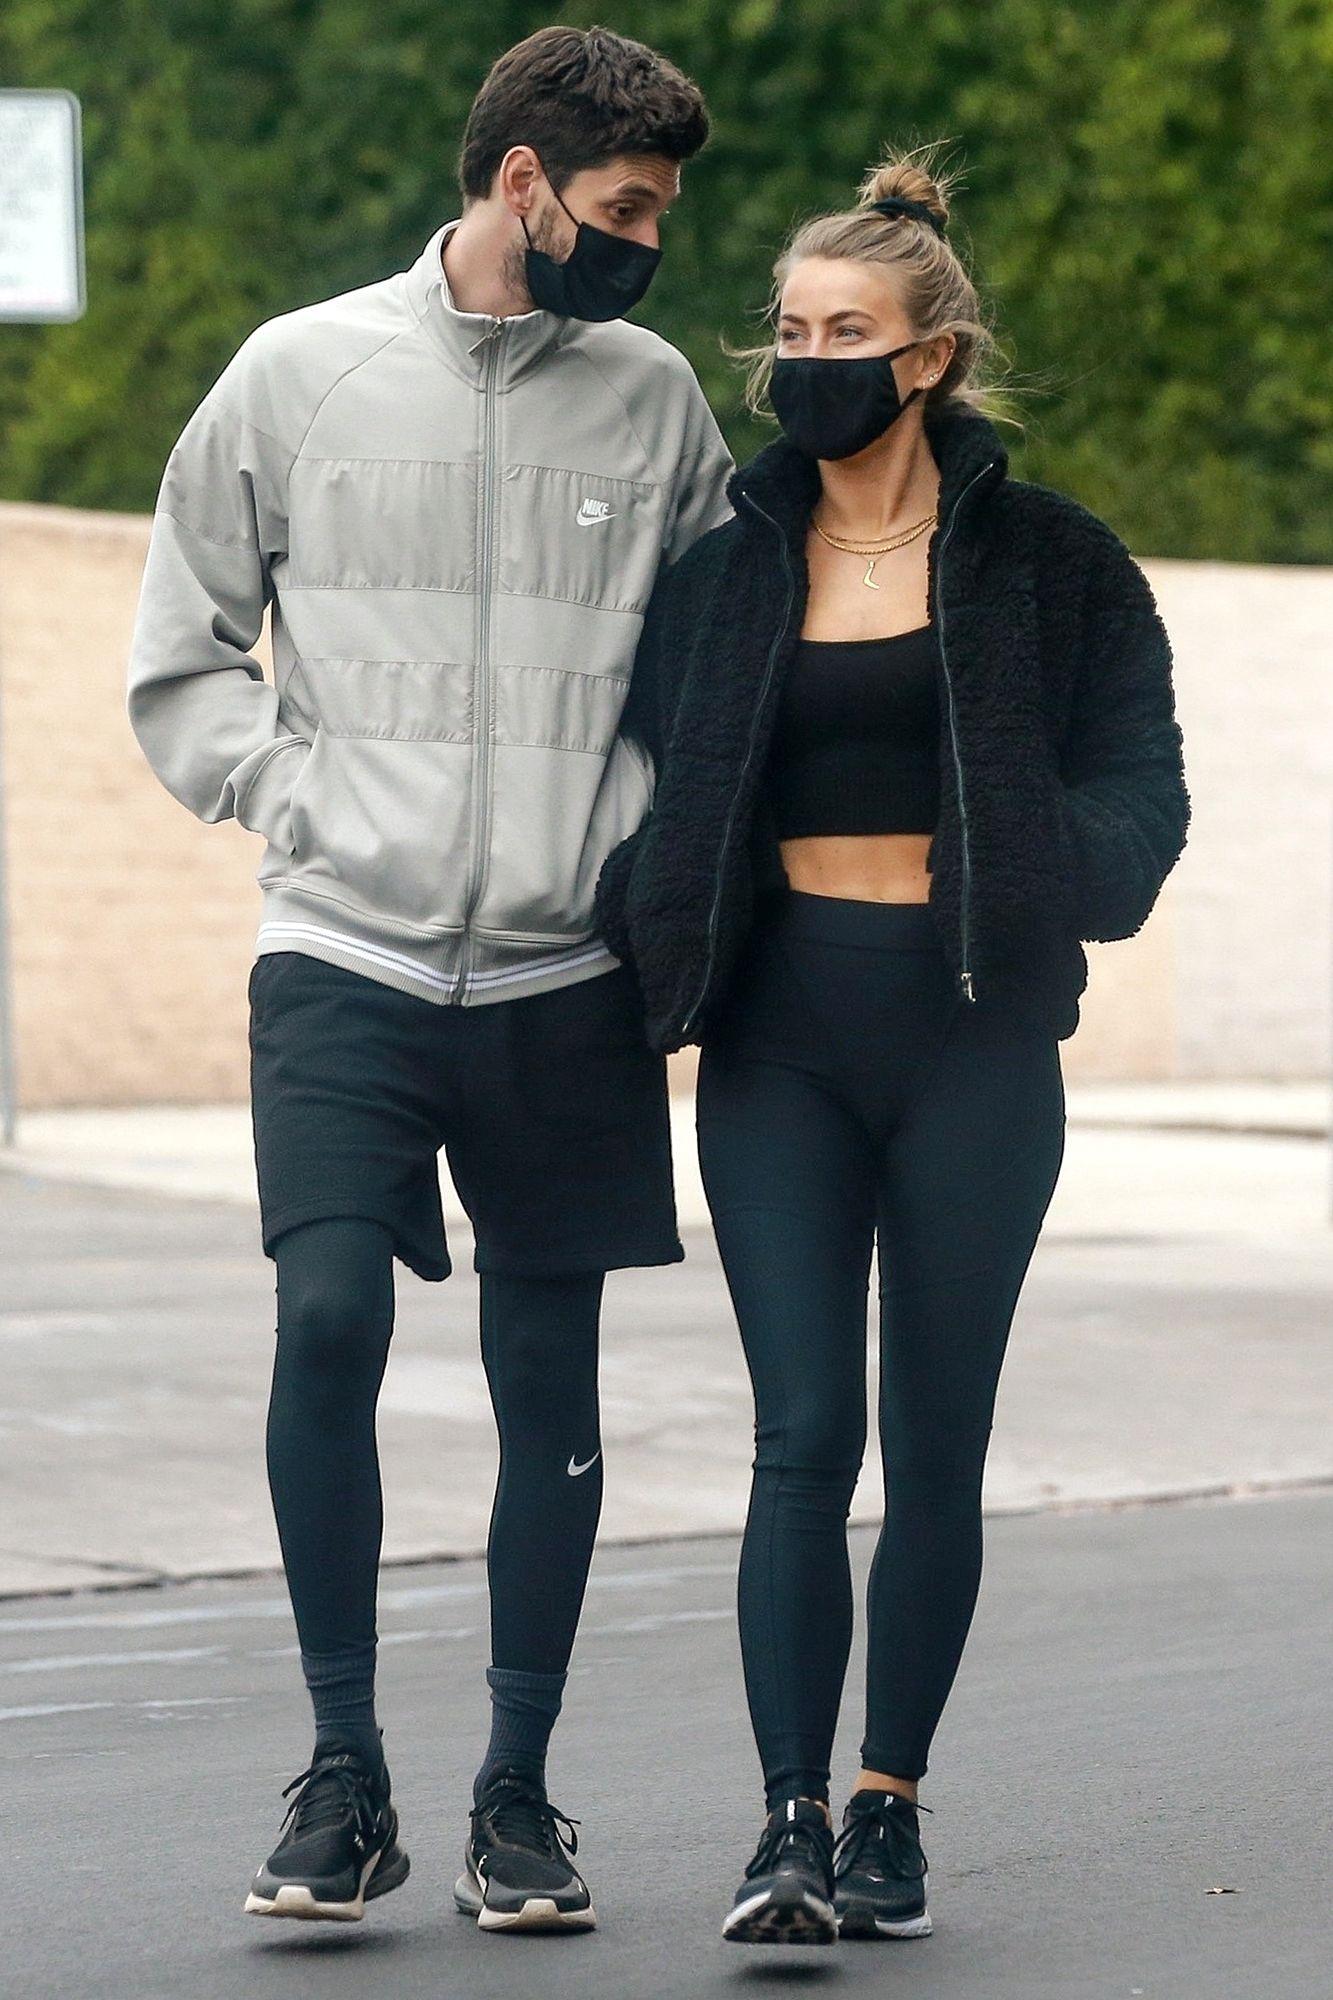 Julianne Hough and Ben Barnes Spark Romance Rumors